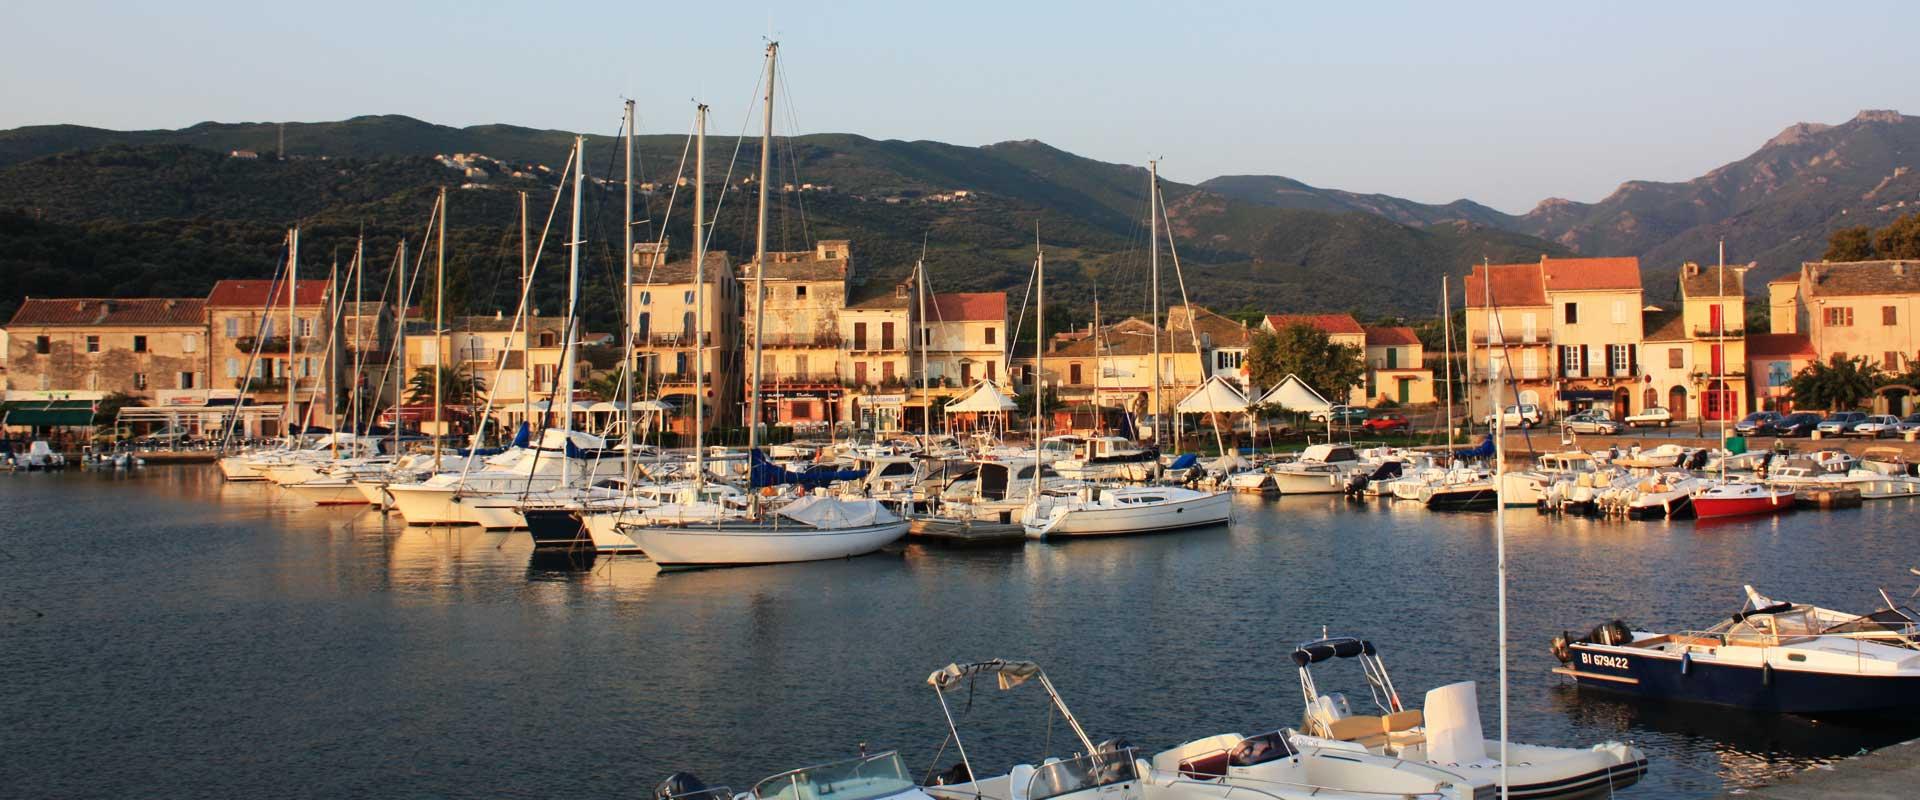 Témoignage - Corse - Macinaggio